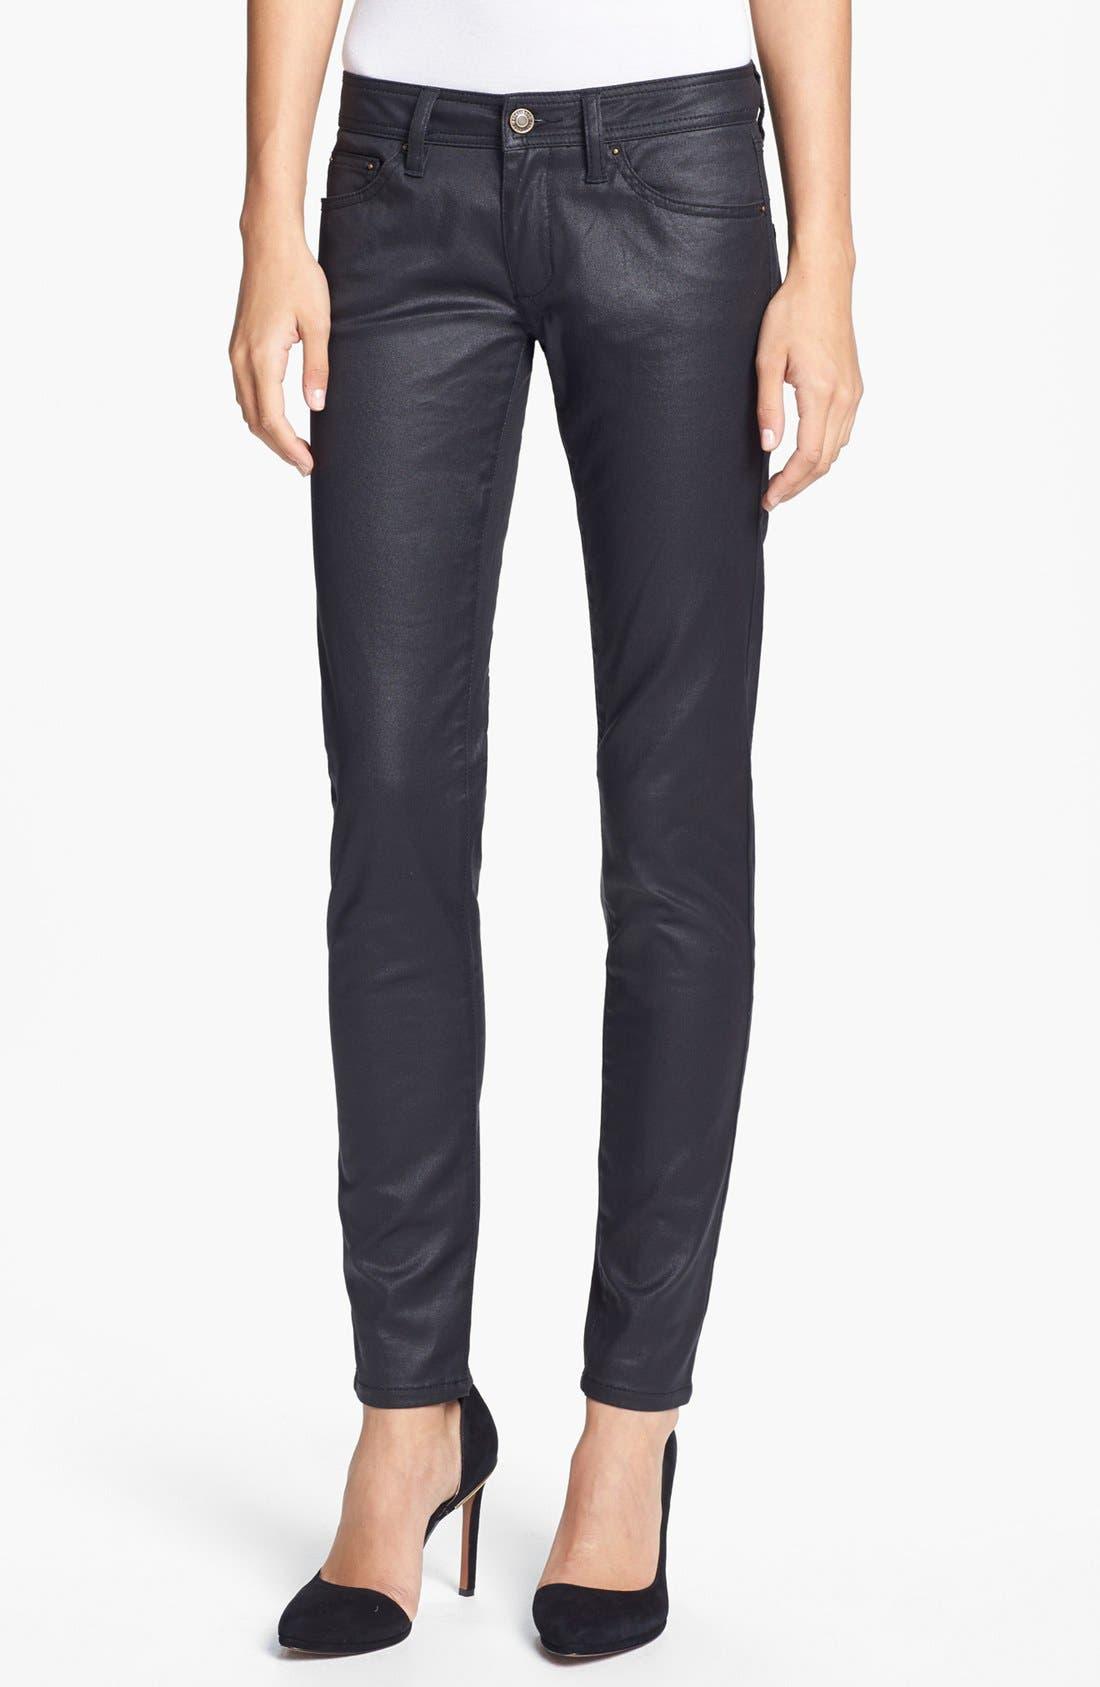 Main Image - Rachel Zoe 'Julie' Skinny High Gloss Coated Jeans